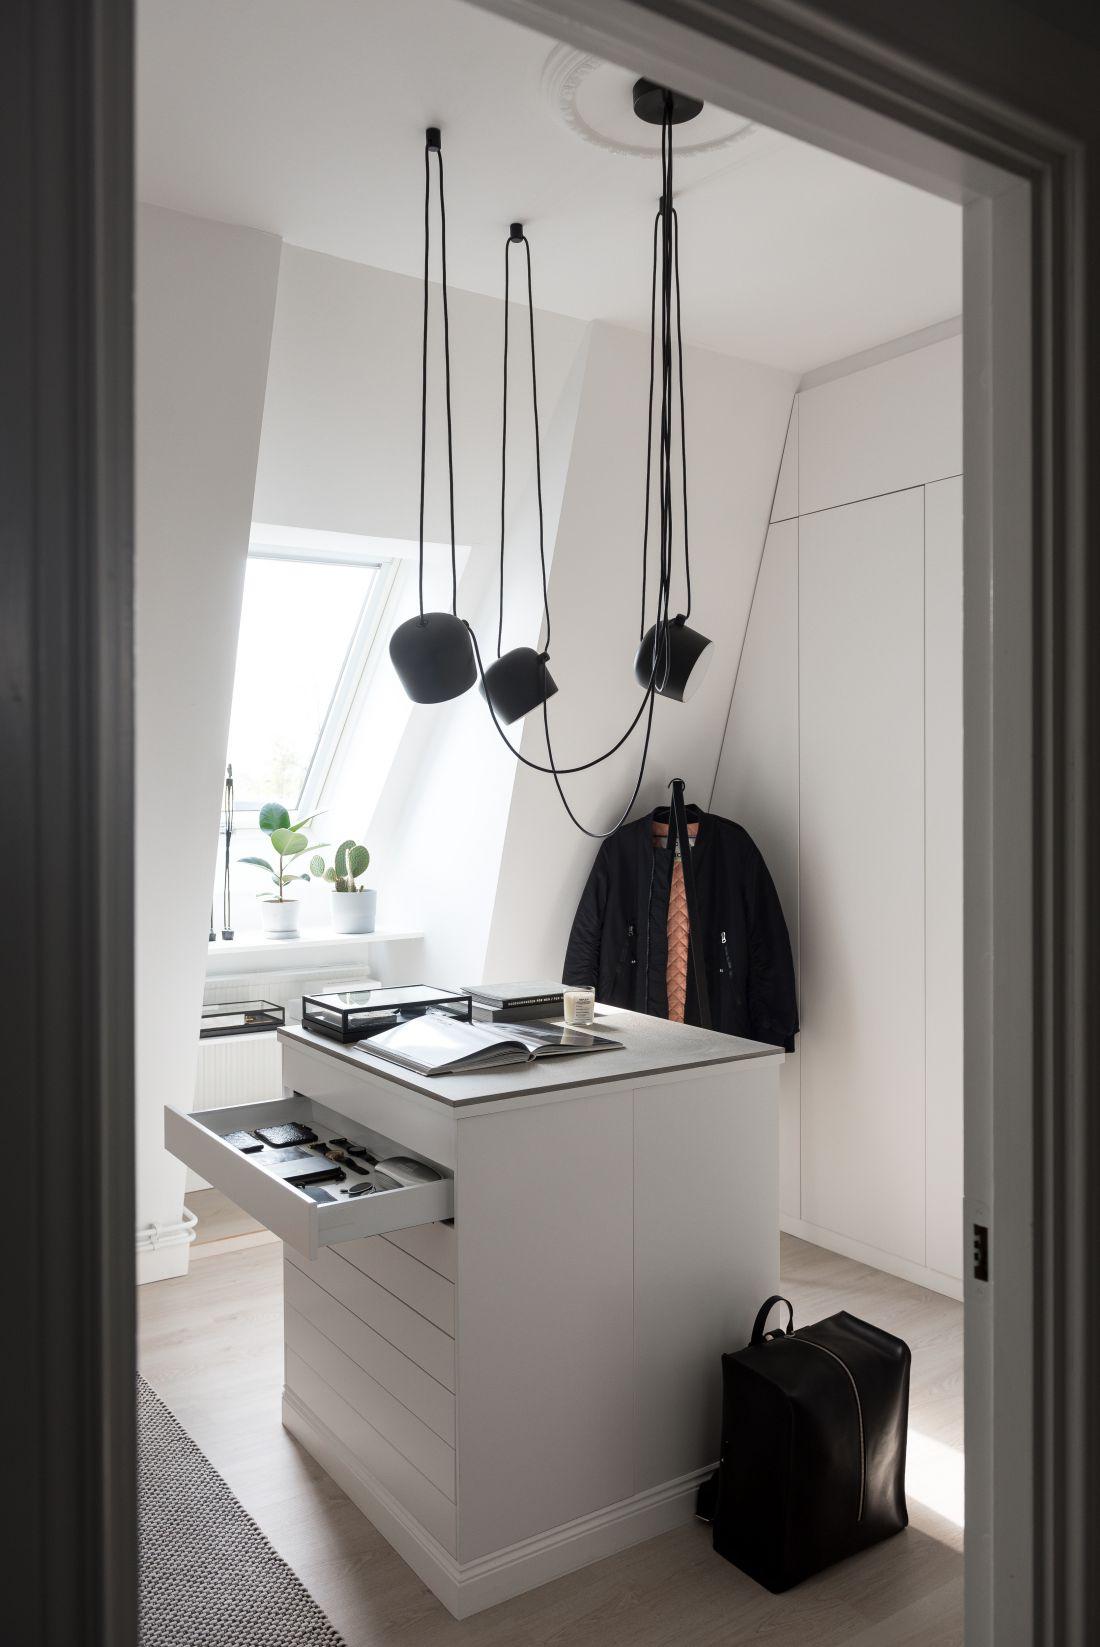 Garderoba w mieszkaniu